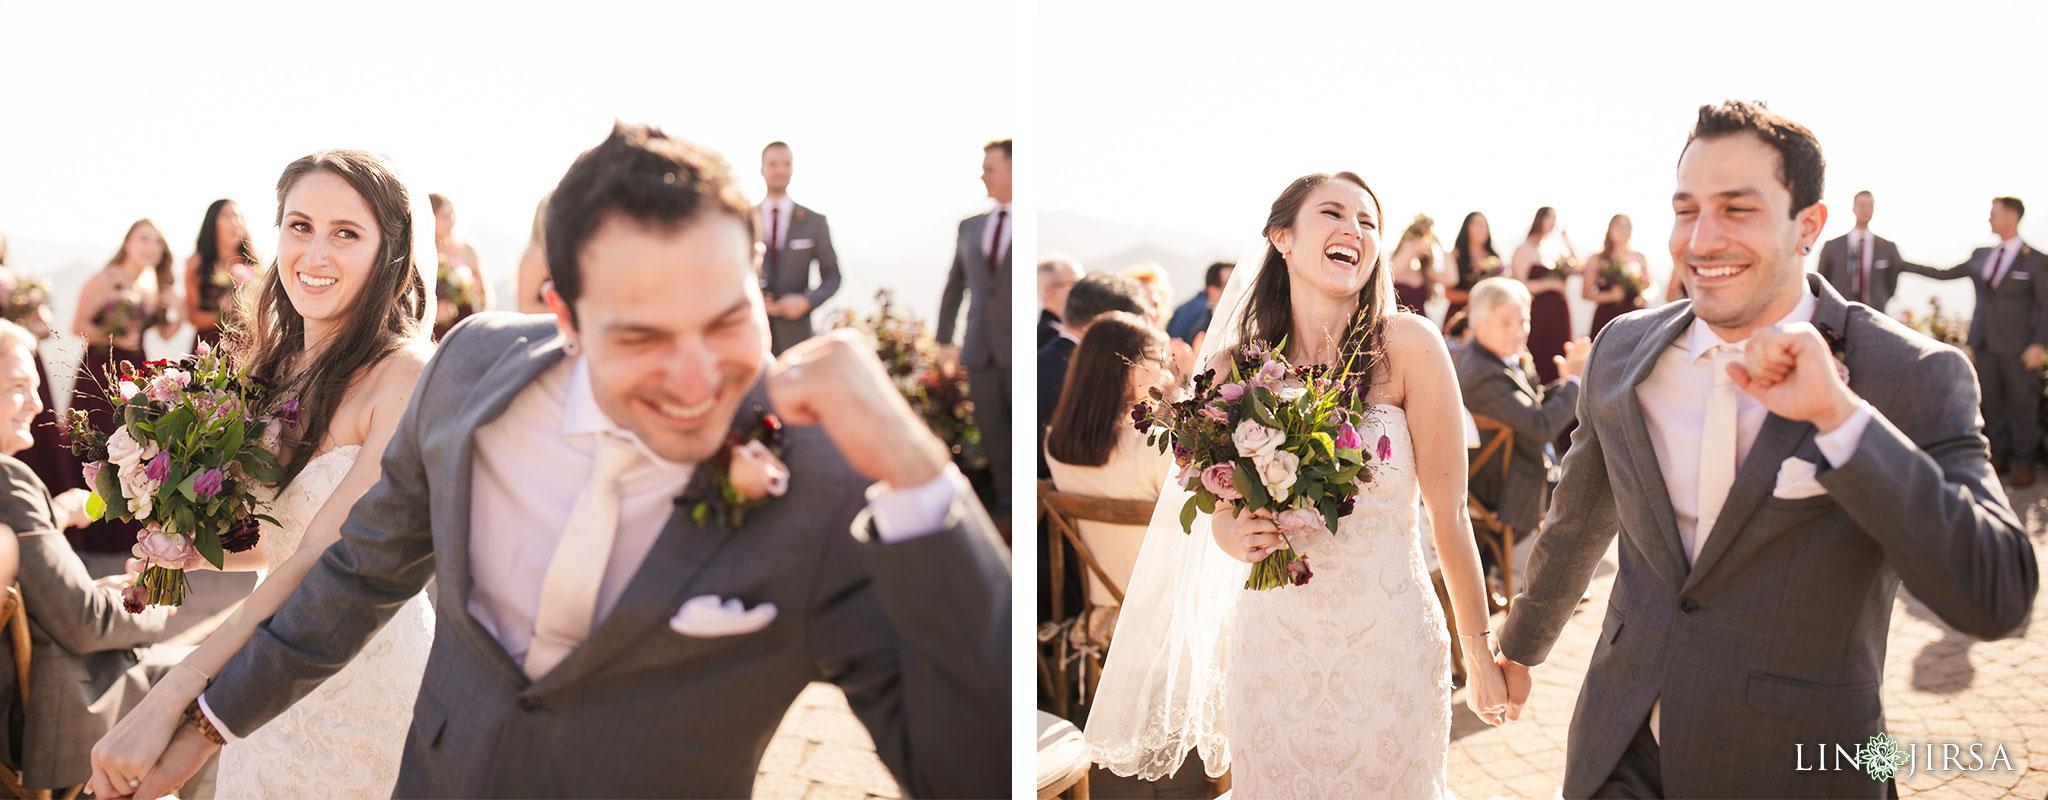 020 malibu rocky oaks wedding photography